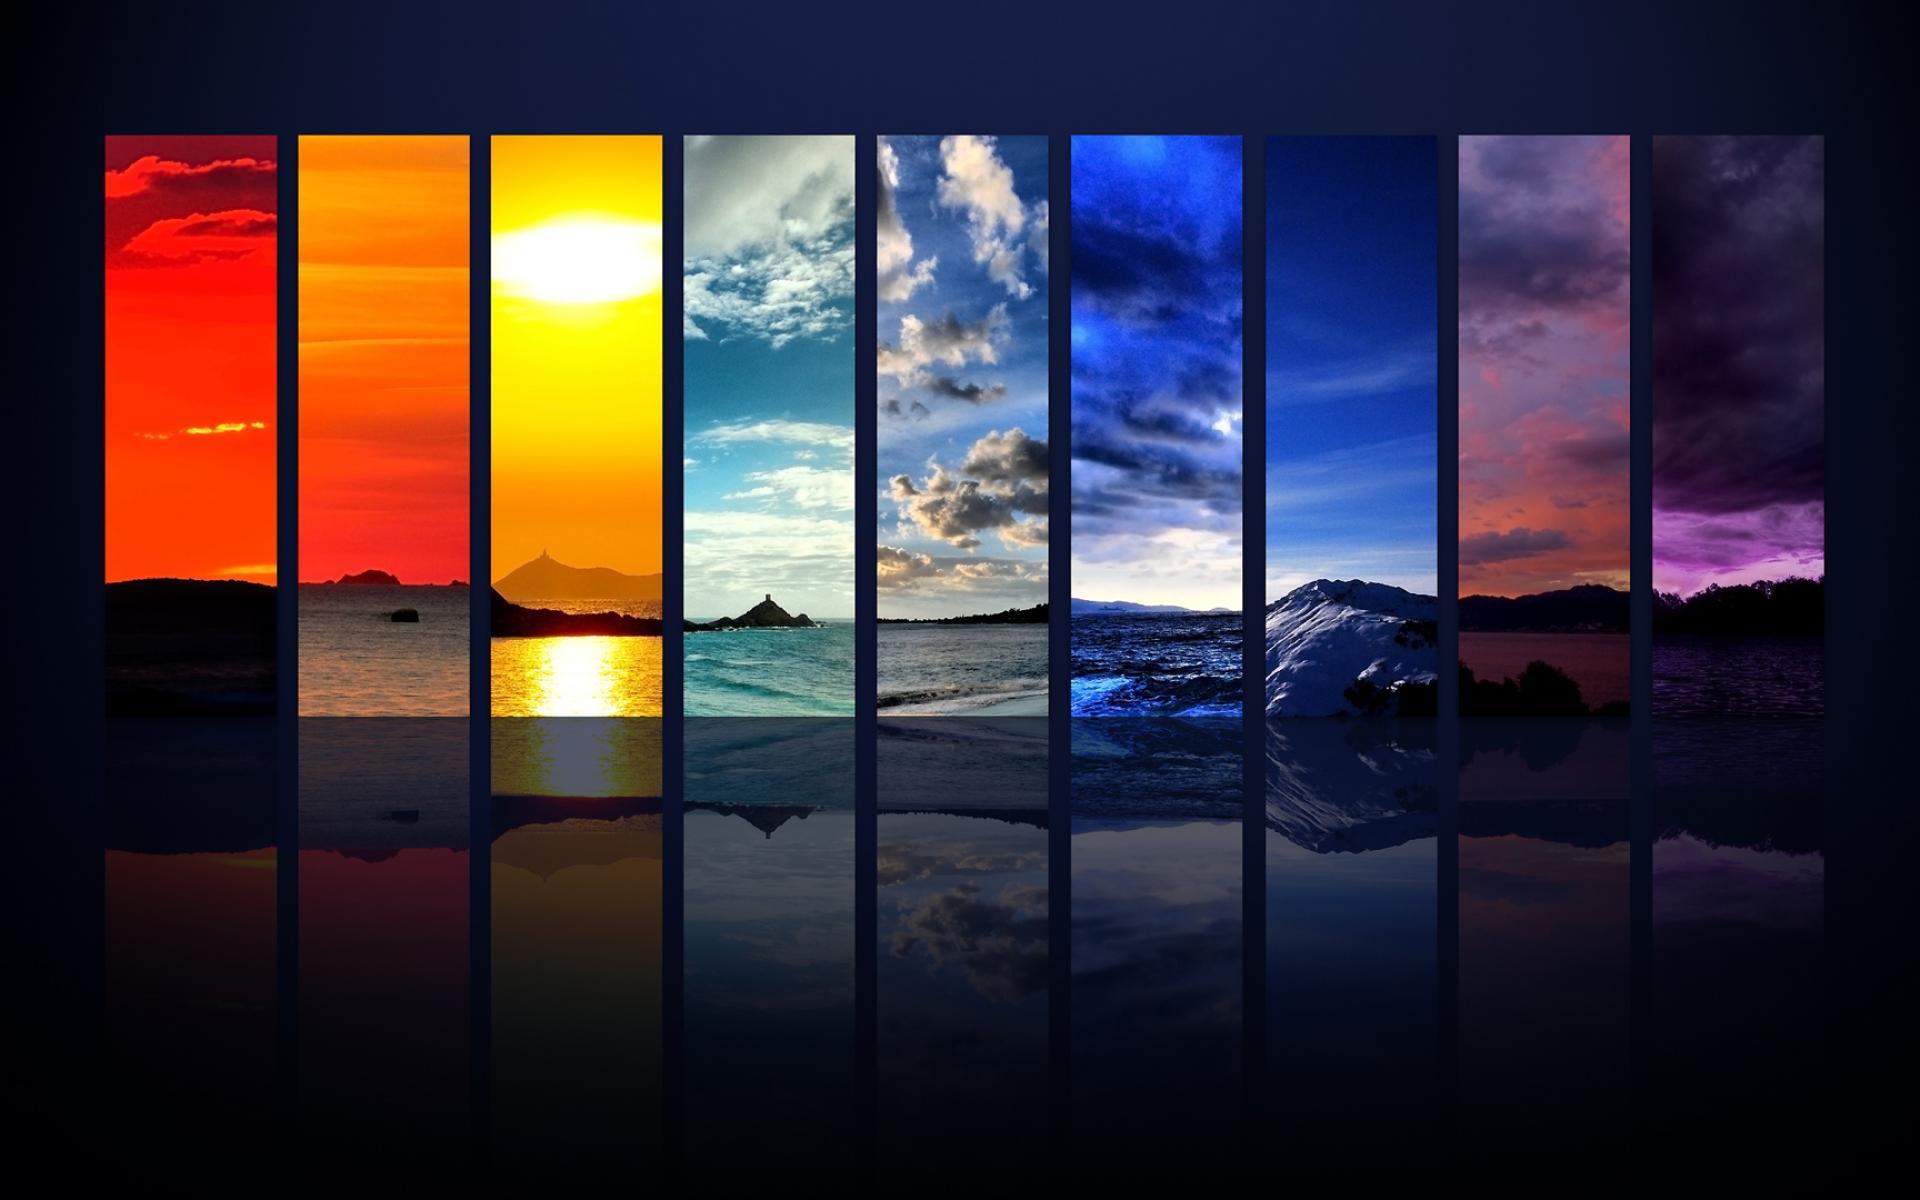 Fall Halloween Desktop Wallpaper Design Backgrounds Download Pixelstalk Net